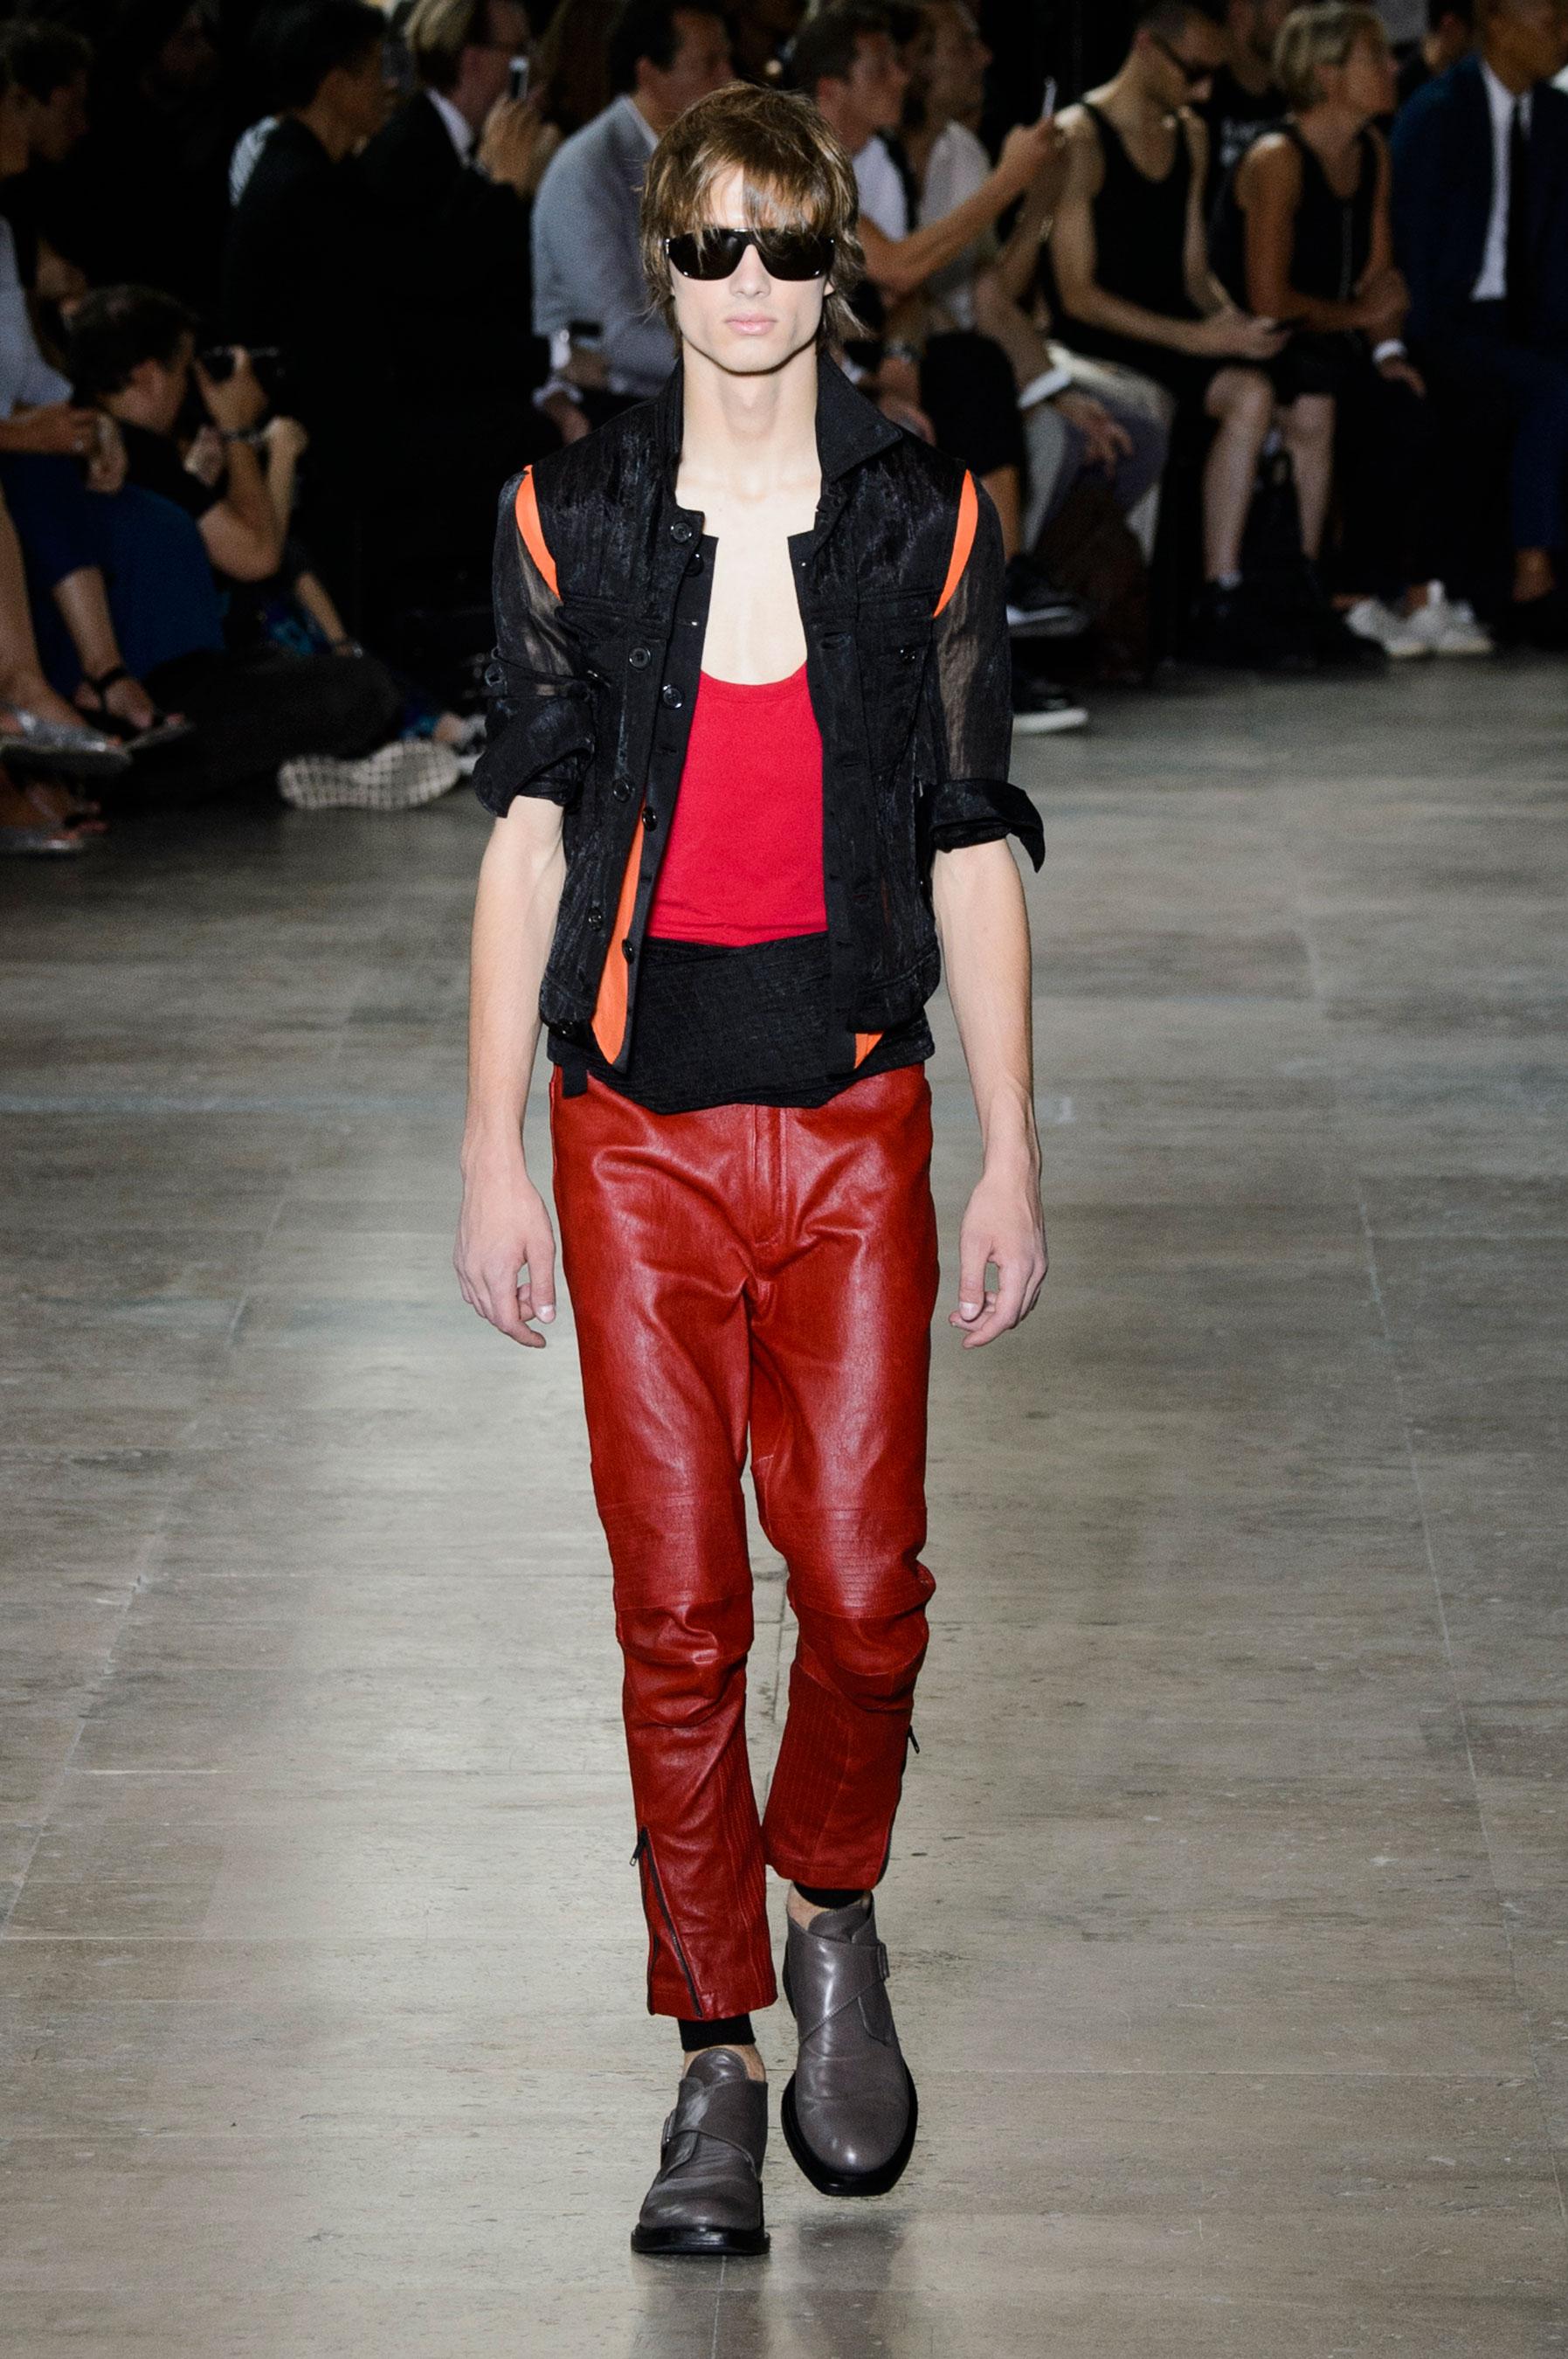 Ann Demeulemeester Spring/Summer 2016 Menswear Collection   Paris Fashion Week